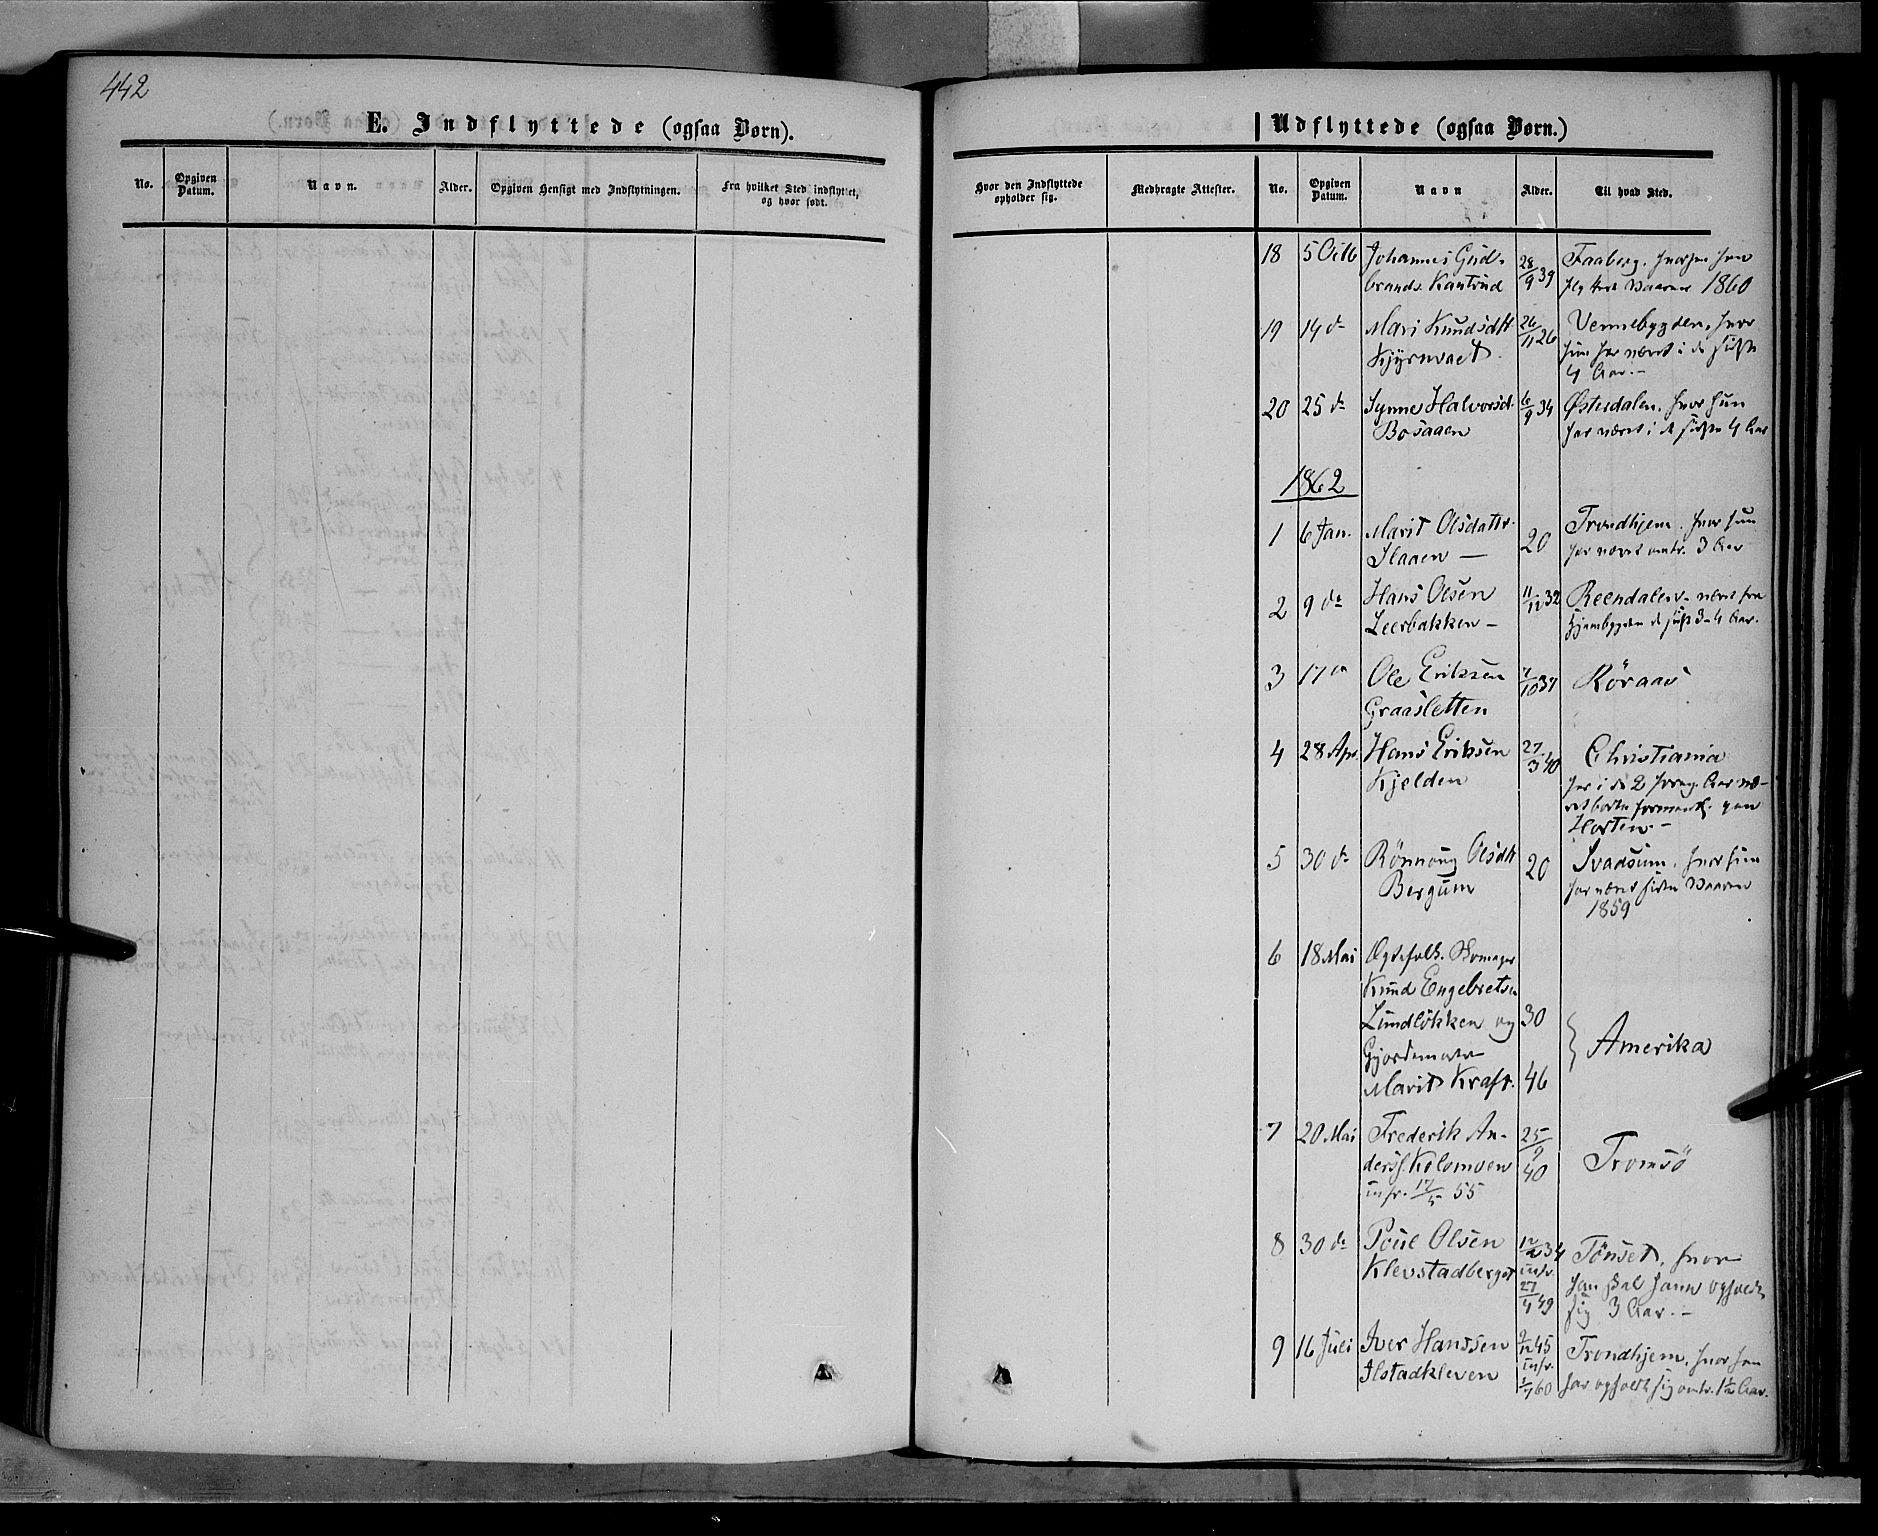 SAH, Nord-Fron prestekontor, Ministerialbok nr. 1, 1851-1864, s. 442